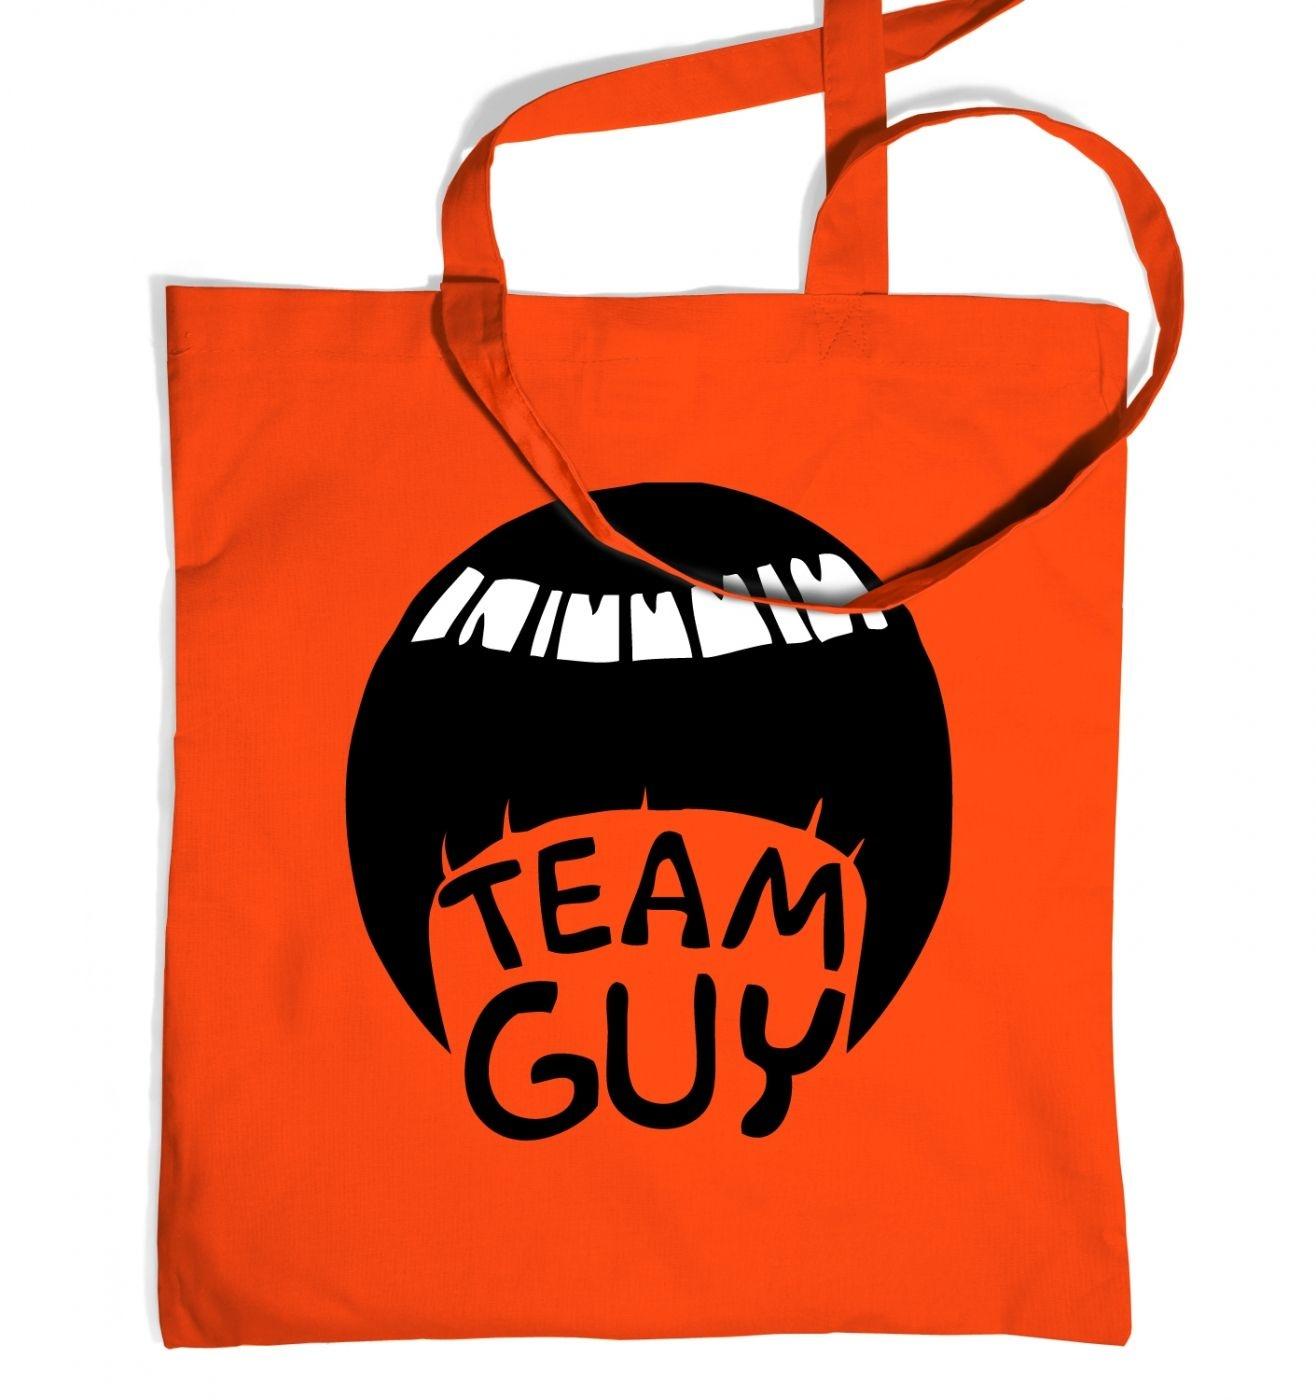 Team Guy - Tote Bag